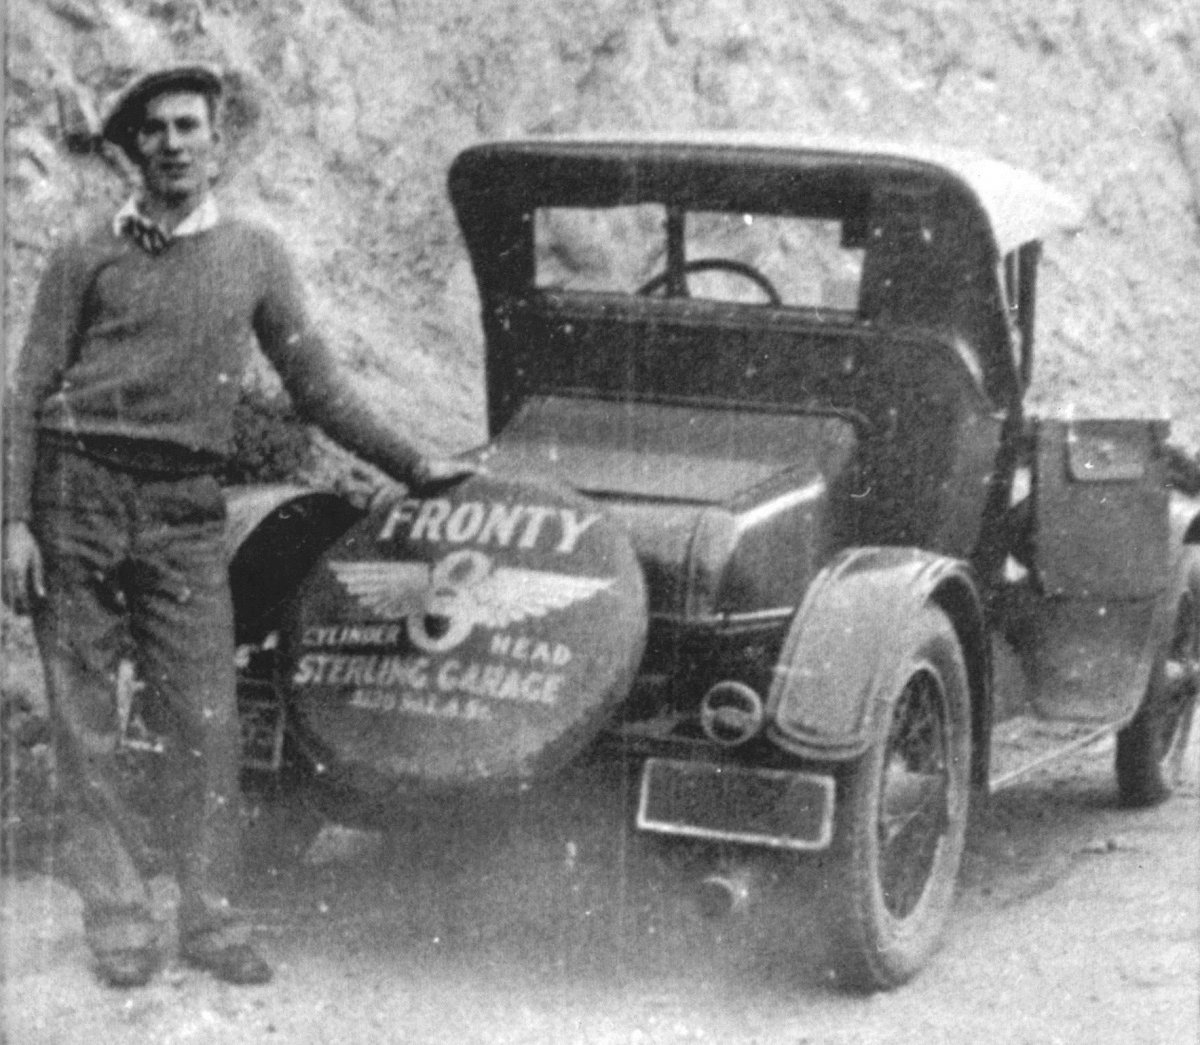 Fronty Spare Tire Catalog.jpg